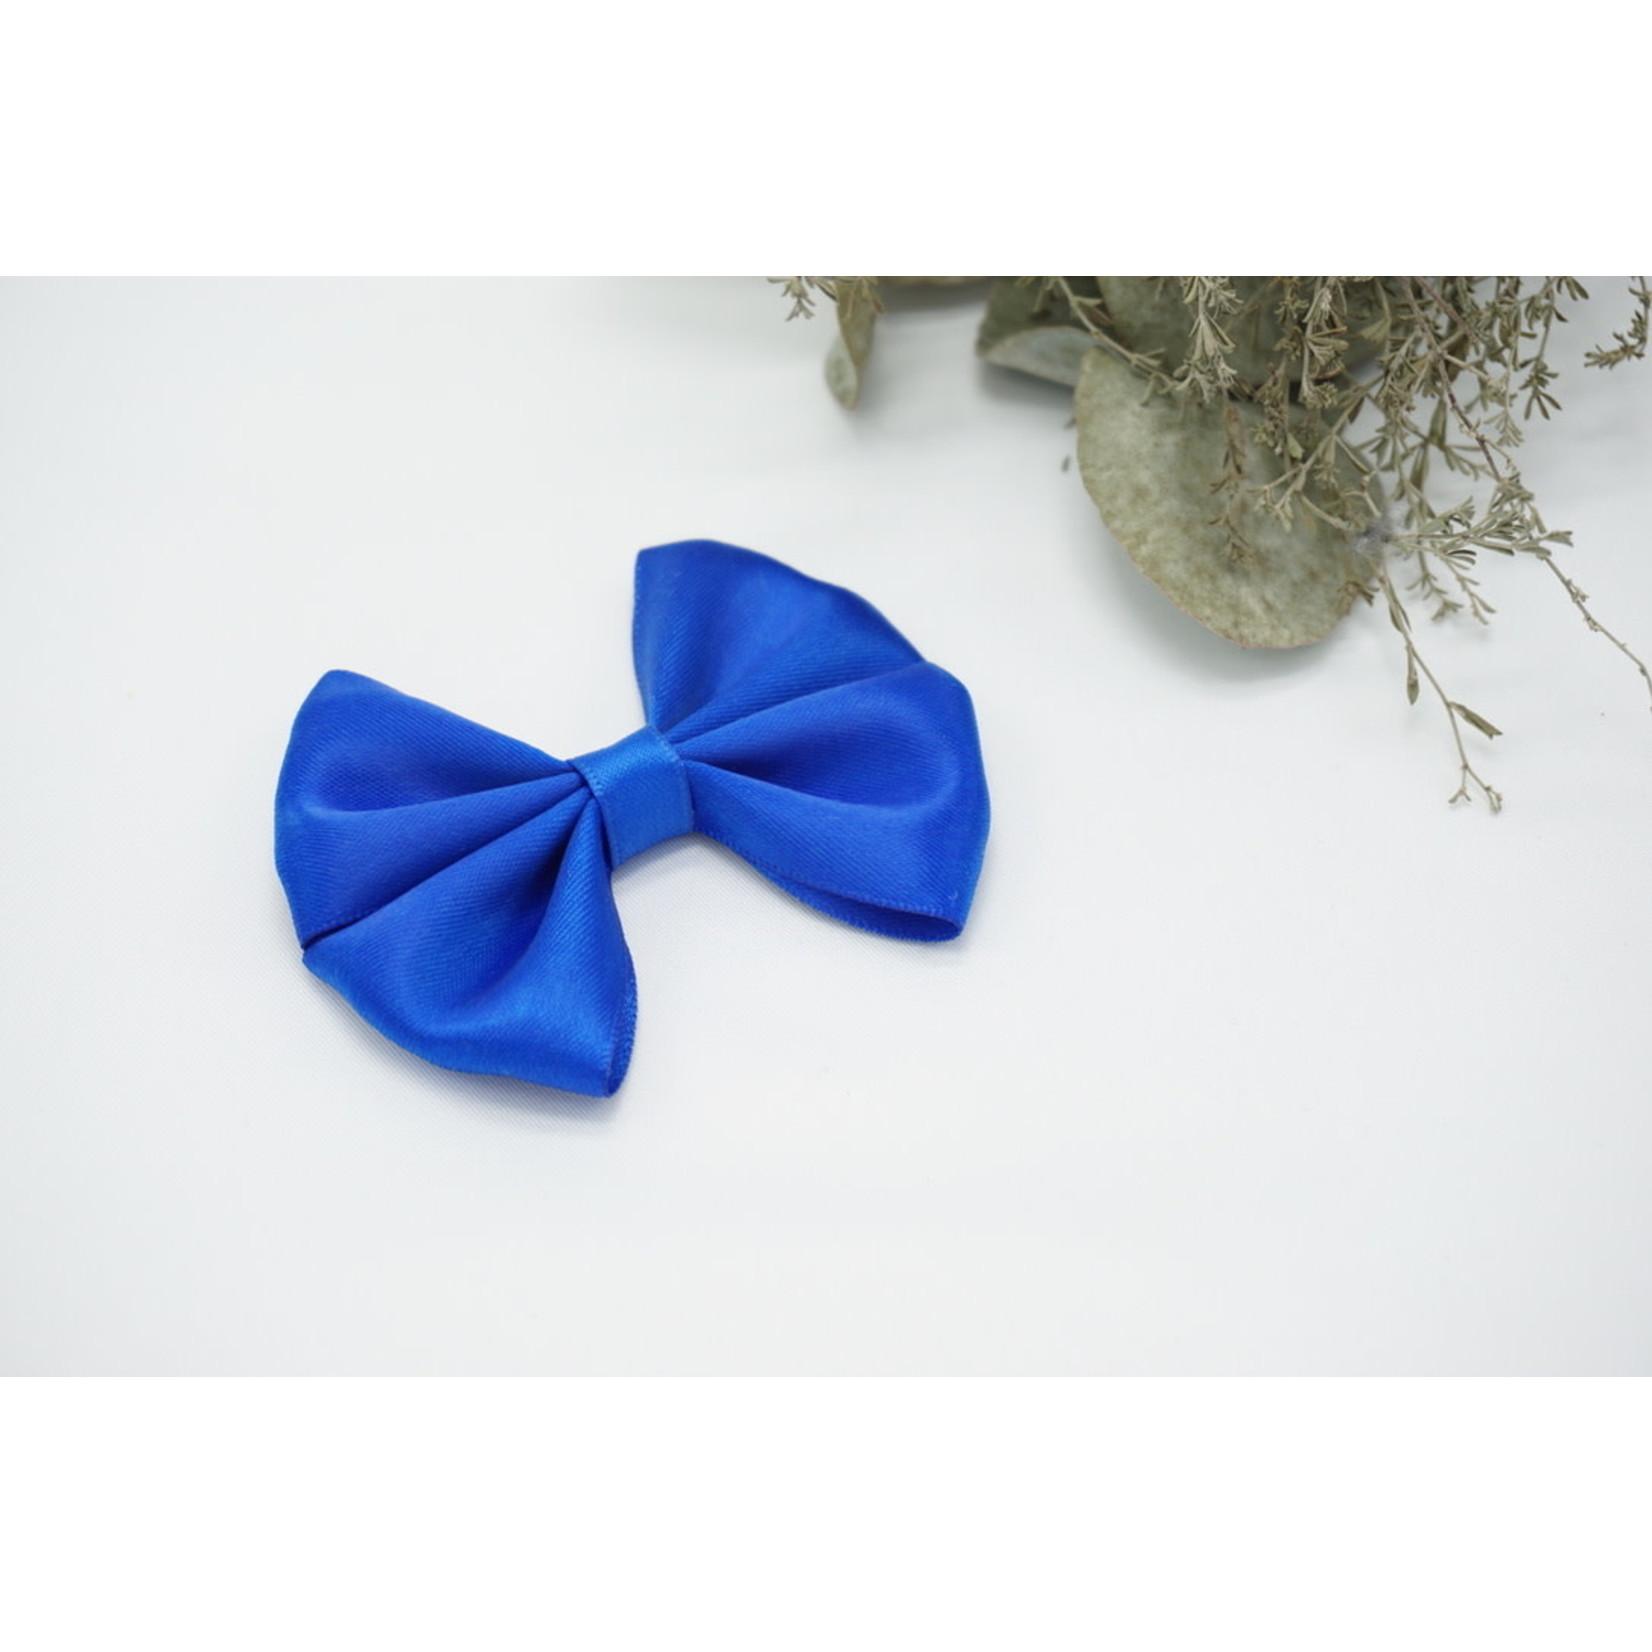 Petite Zara Satin Bow - Royal Blue